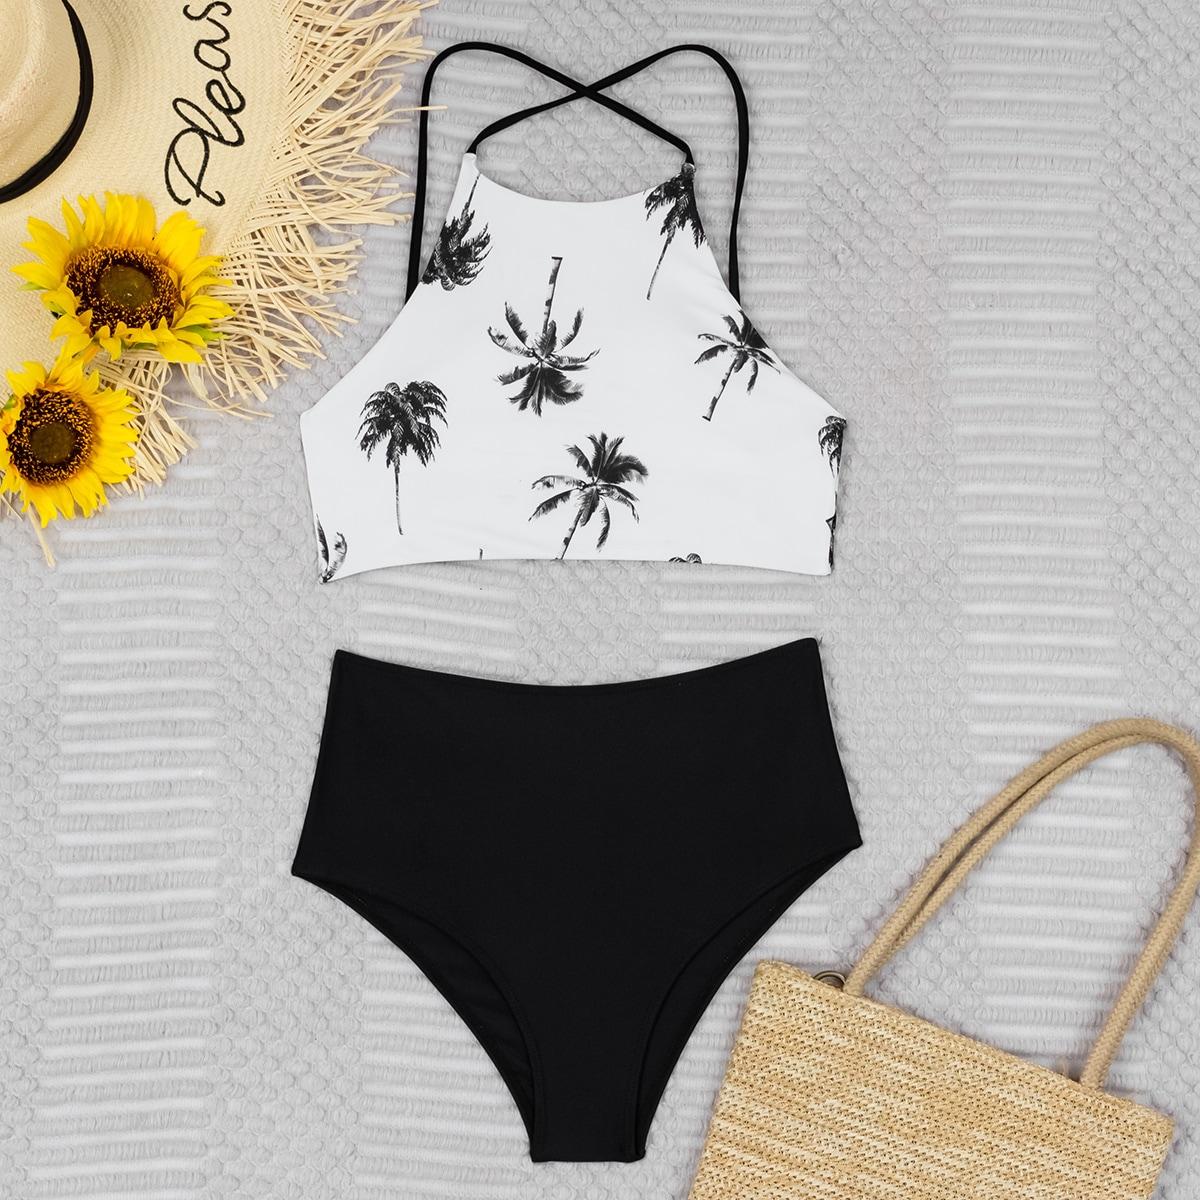 shein Boho Tropisch Bikini sets Kant